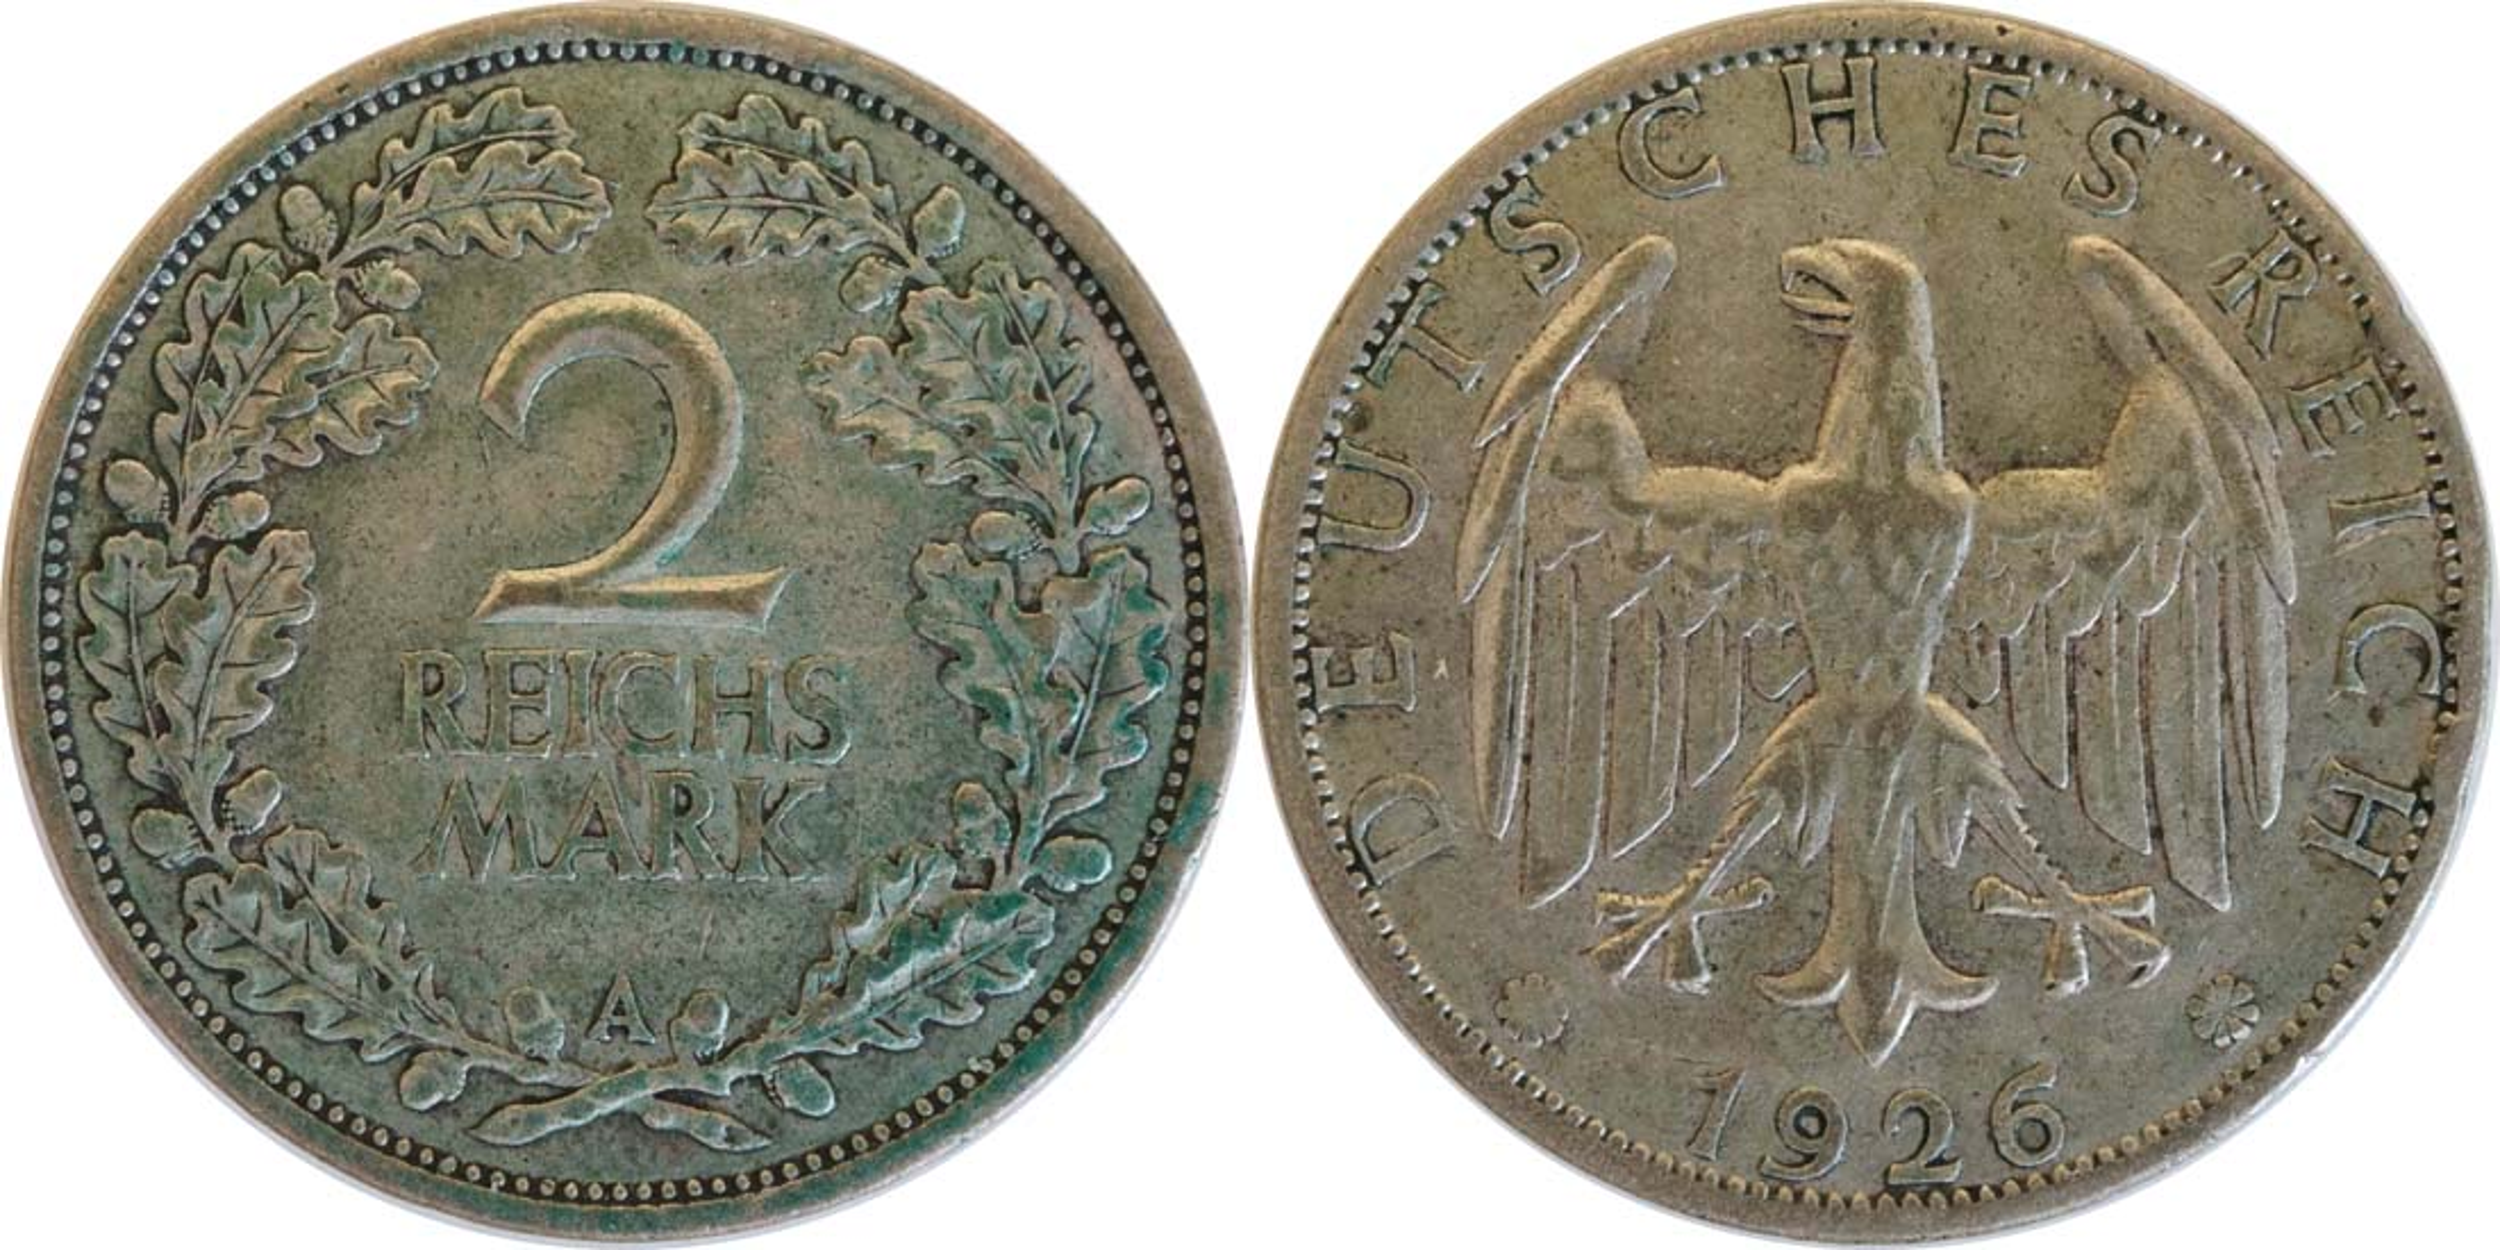 Lieferumfang:Deutschland : 2 Reichsmark Kursmünze patina 1926 ss.